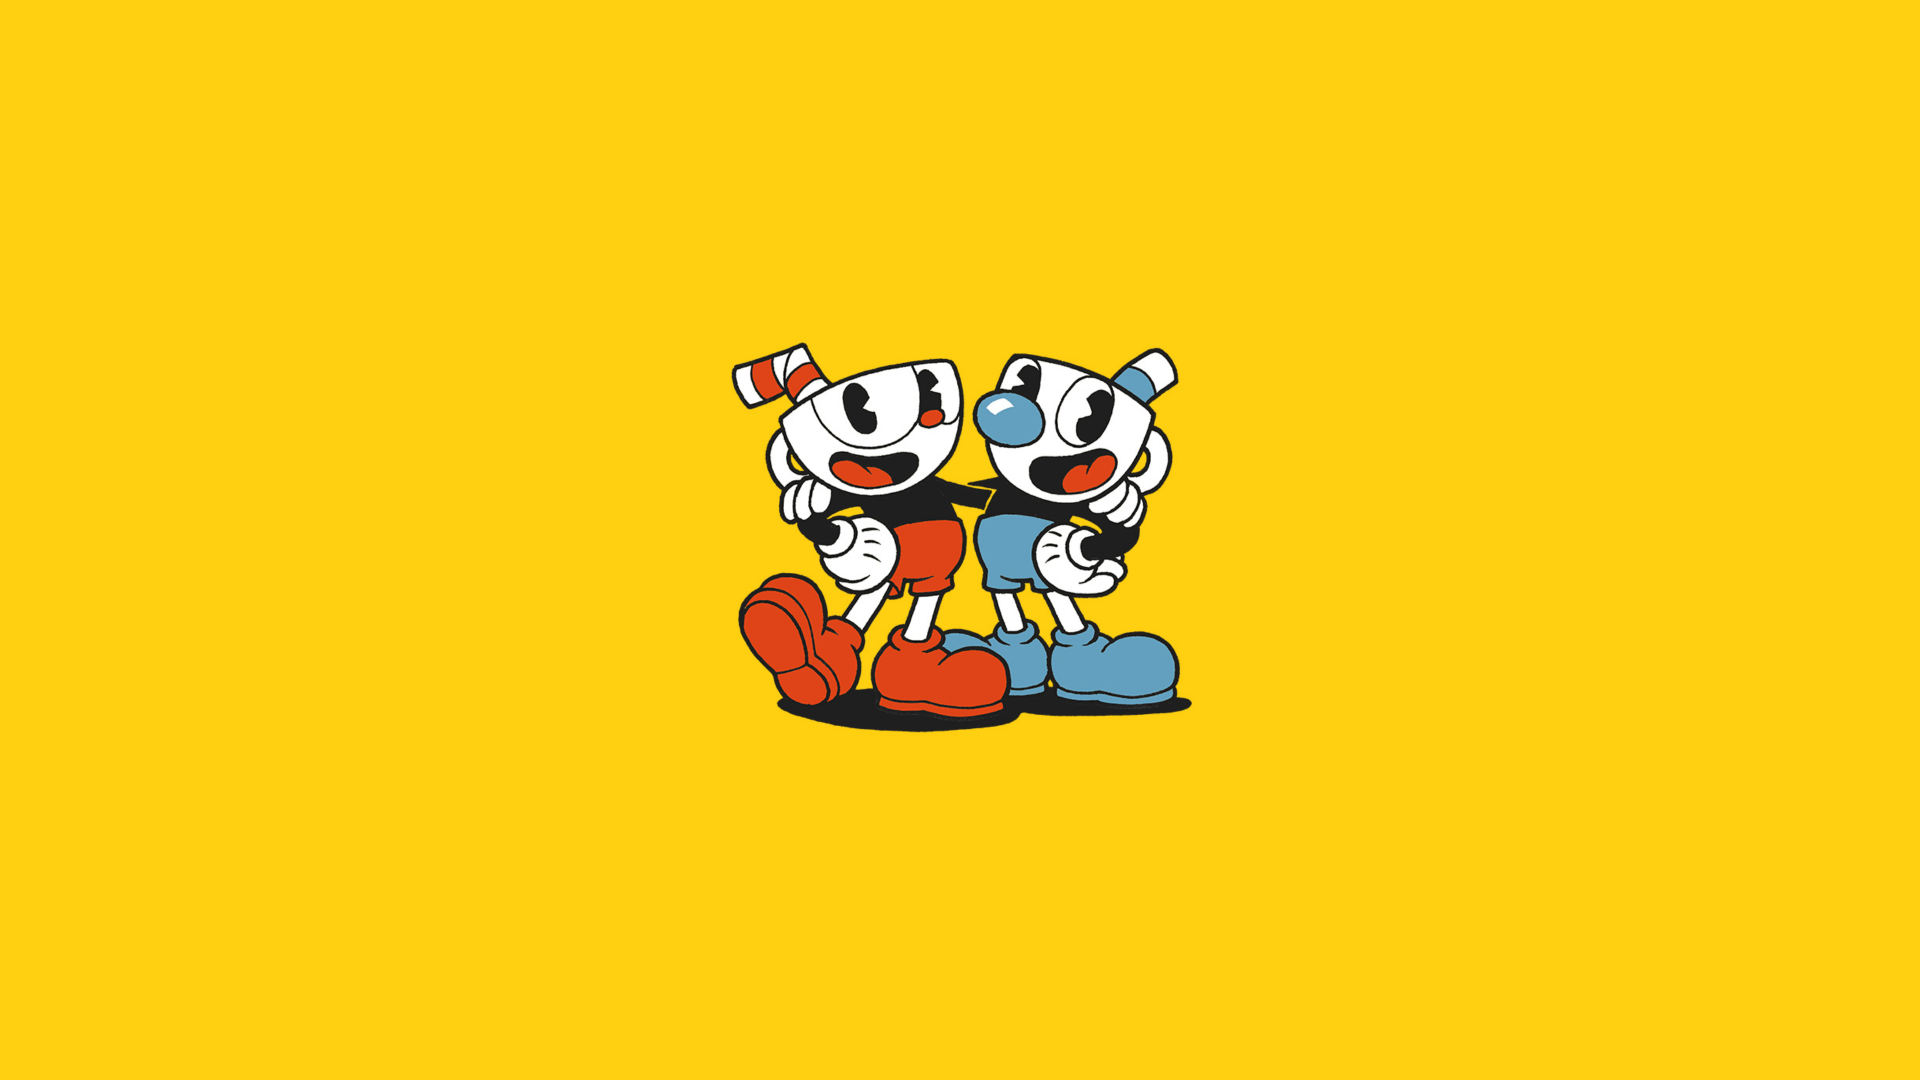 Video Game - Cuphead  Mugman (Cuphead) Wallpaper